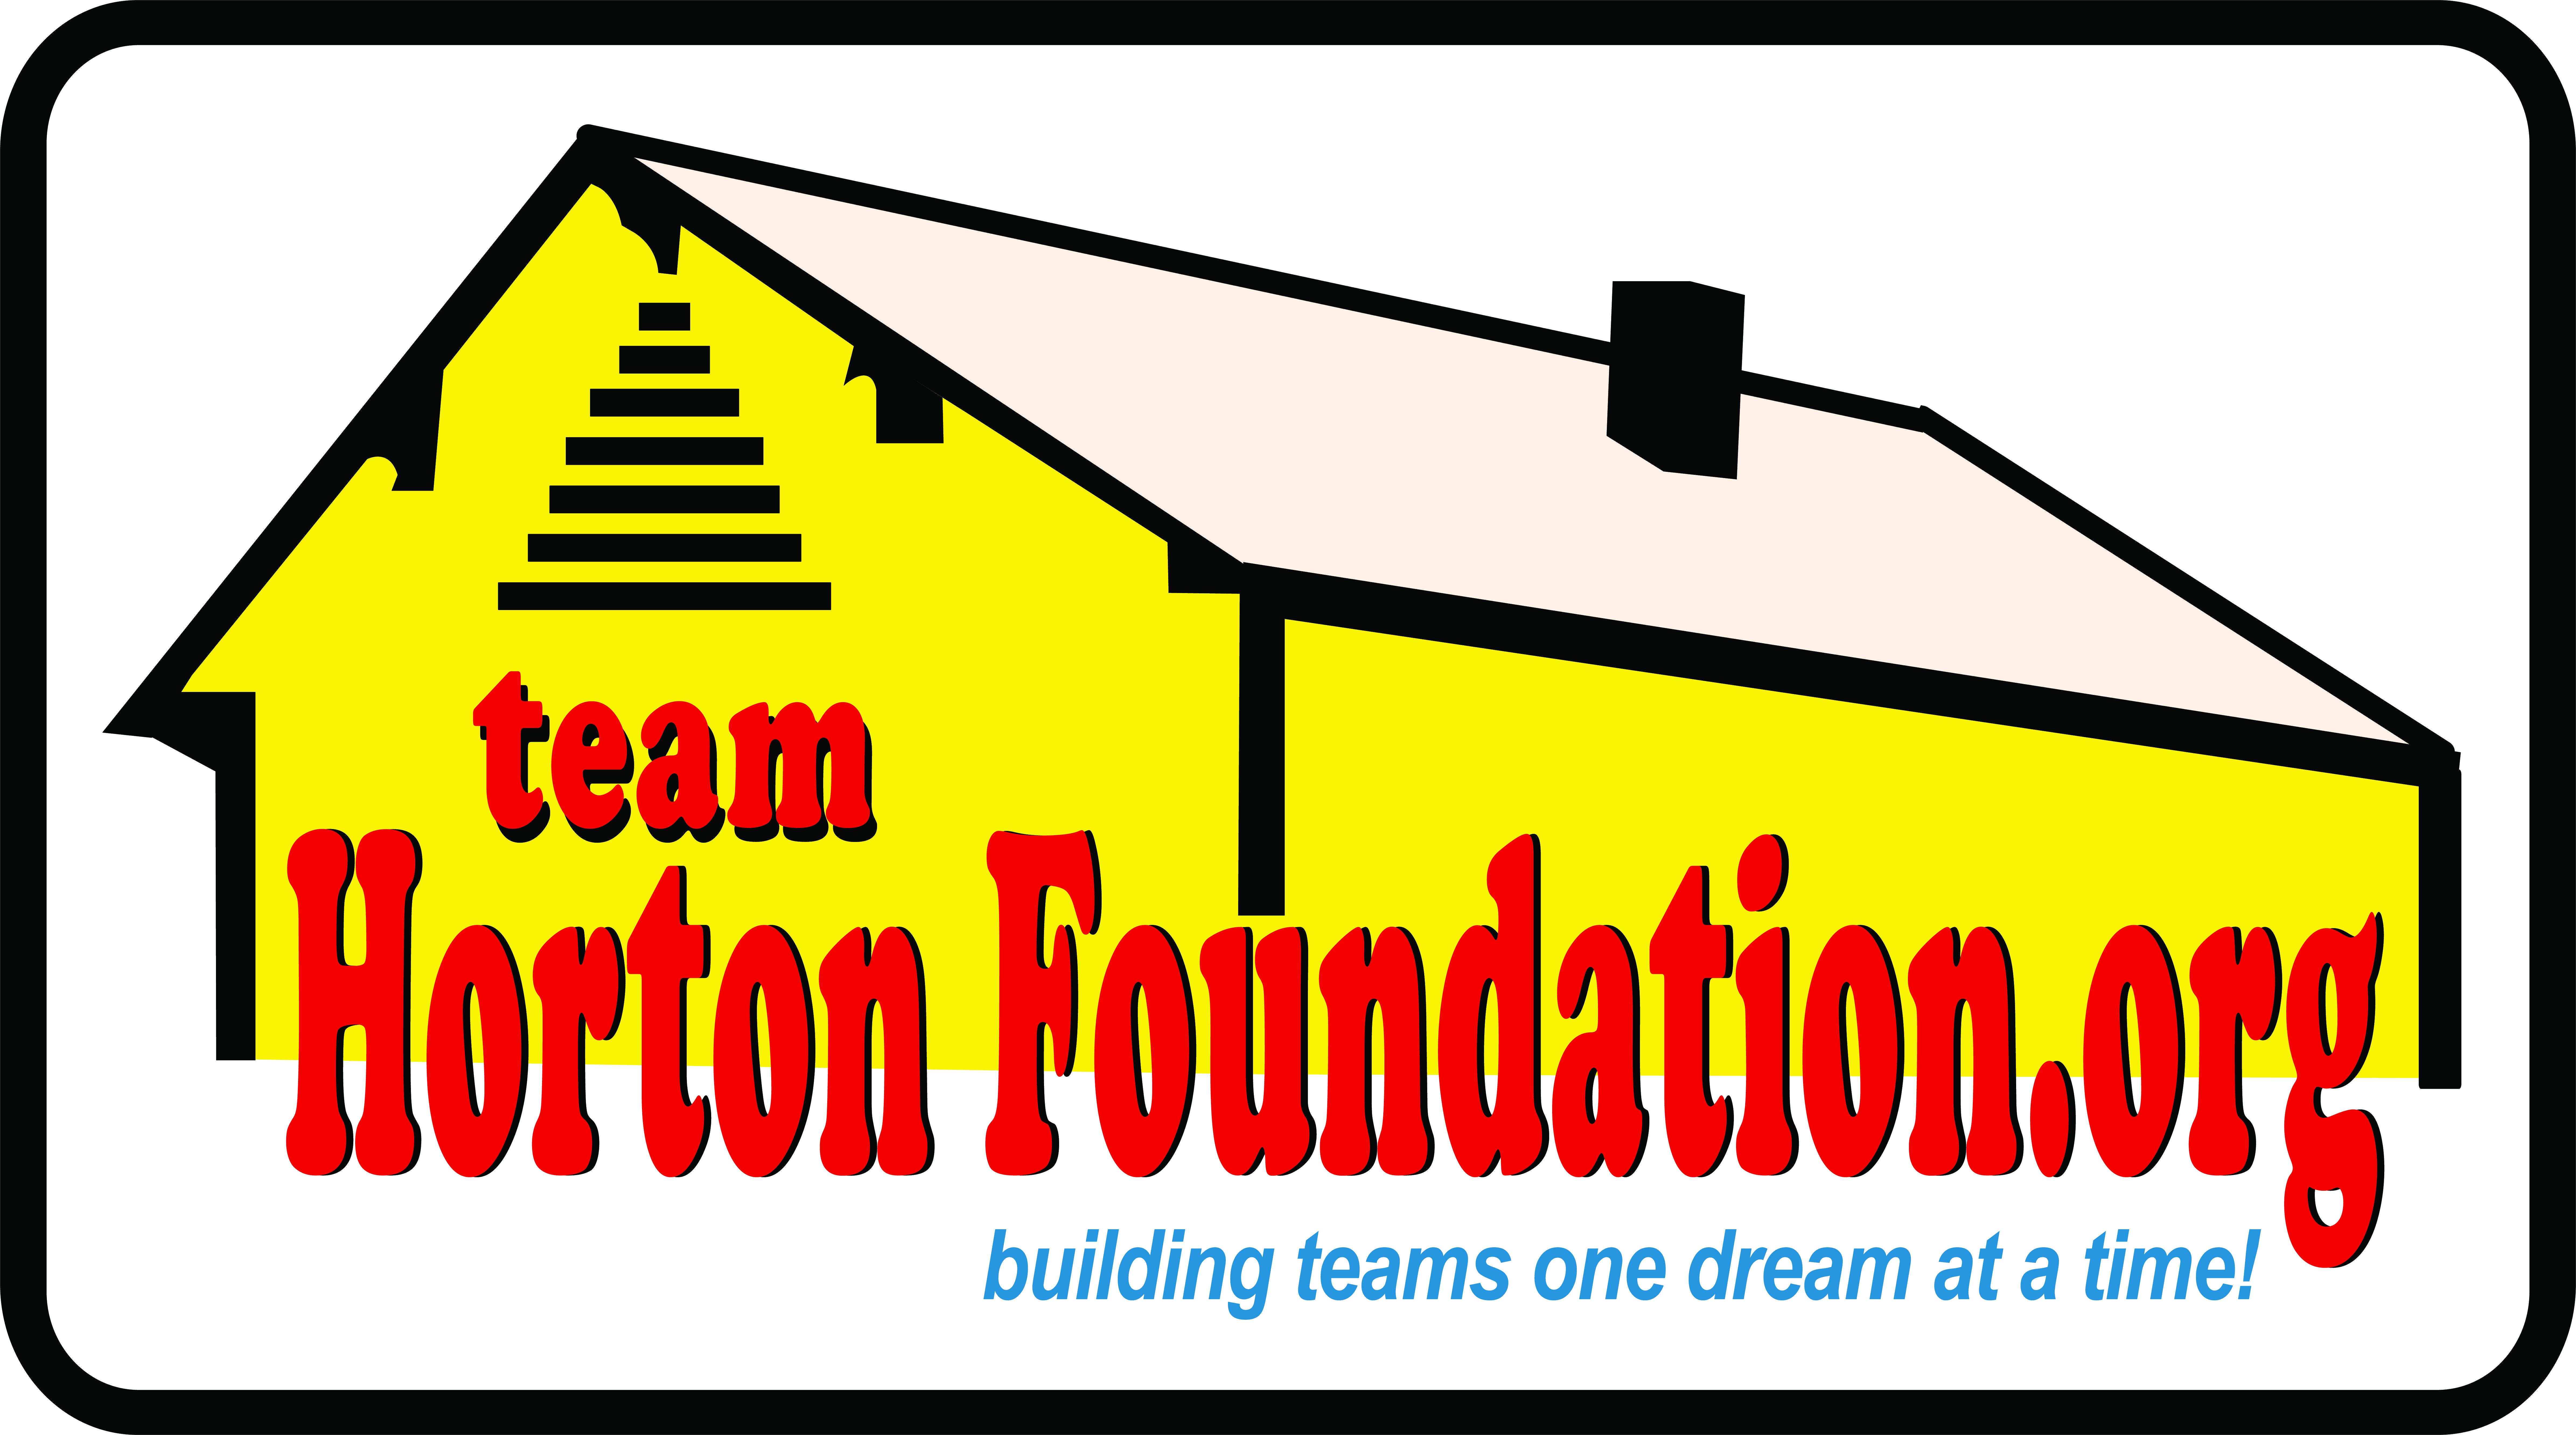 THE OTTO C. HORTON.